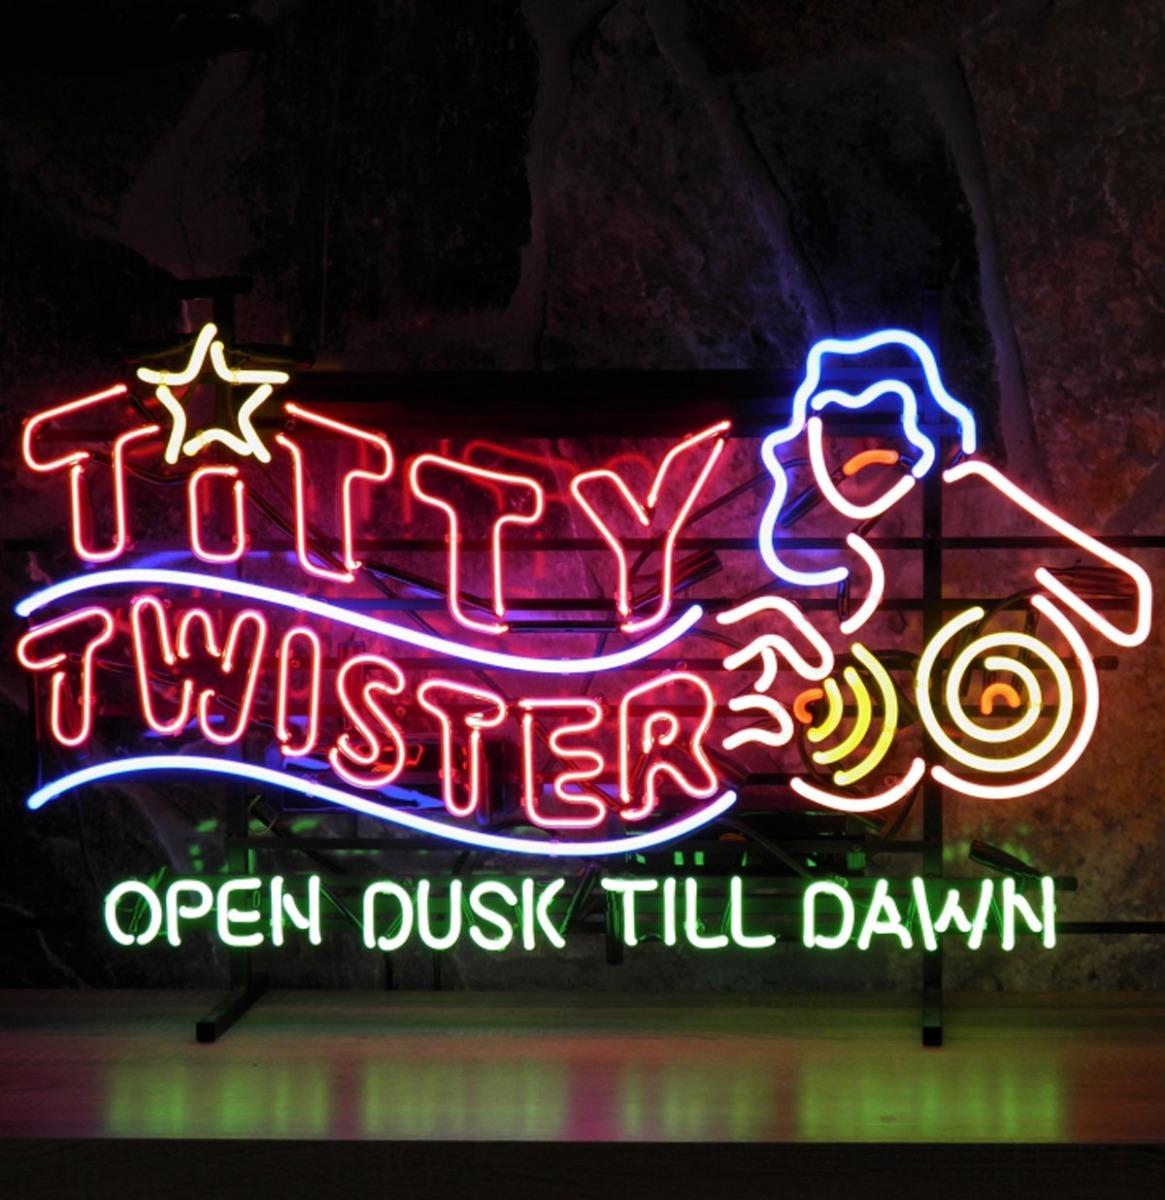 From Dusk Till Dawn Titty Twister Neon Verlichting 100 X 60 Cm